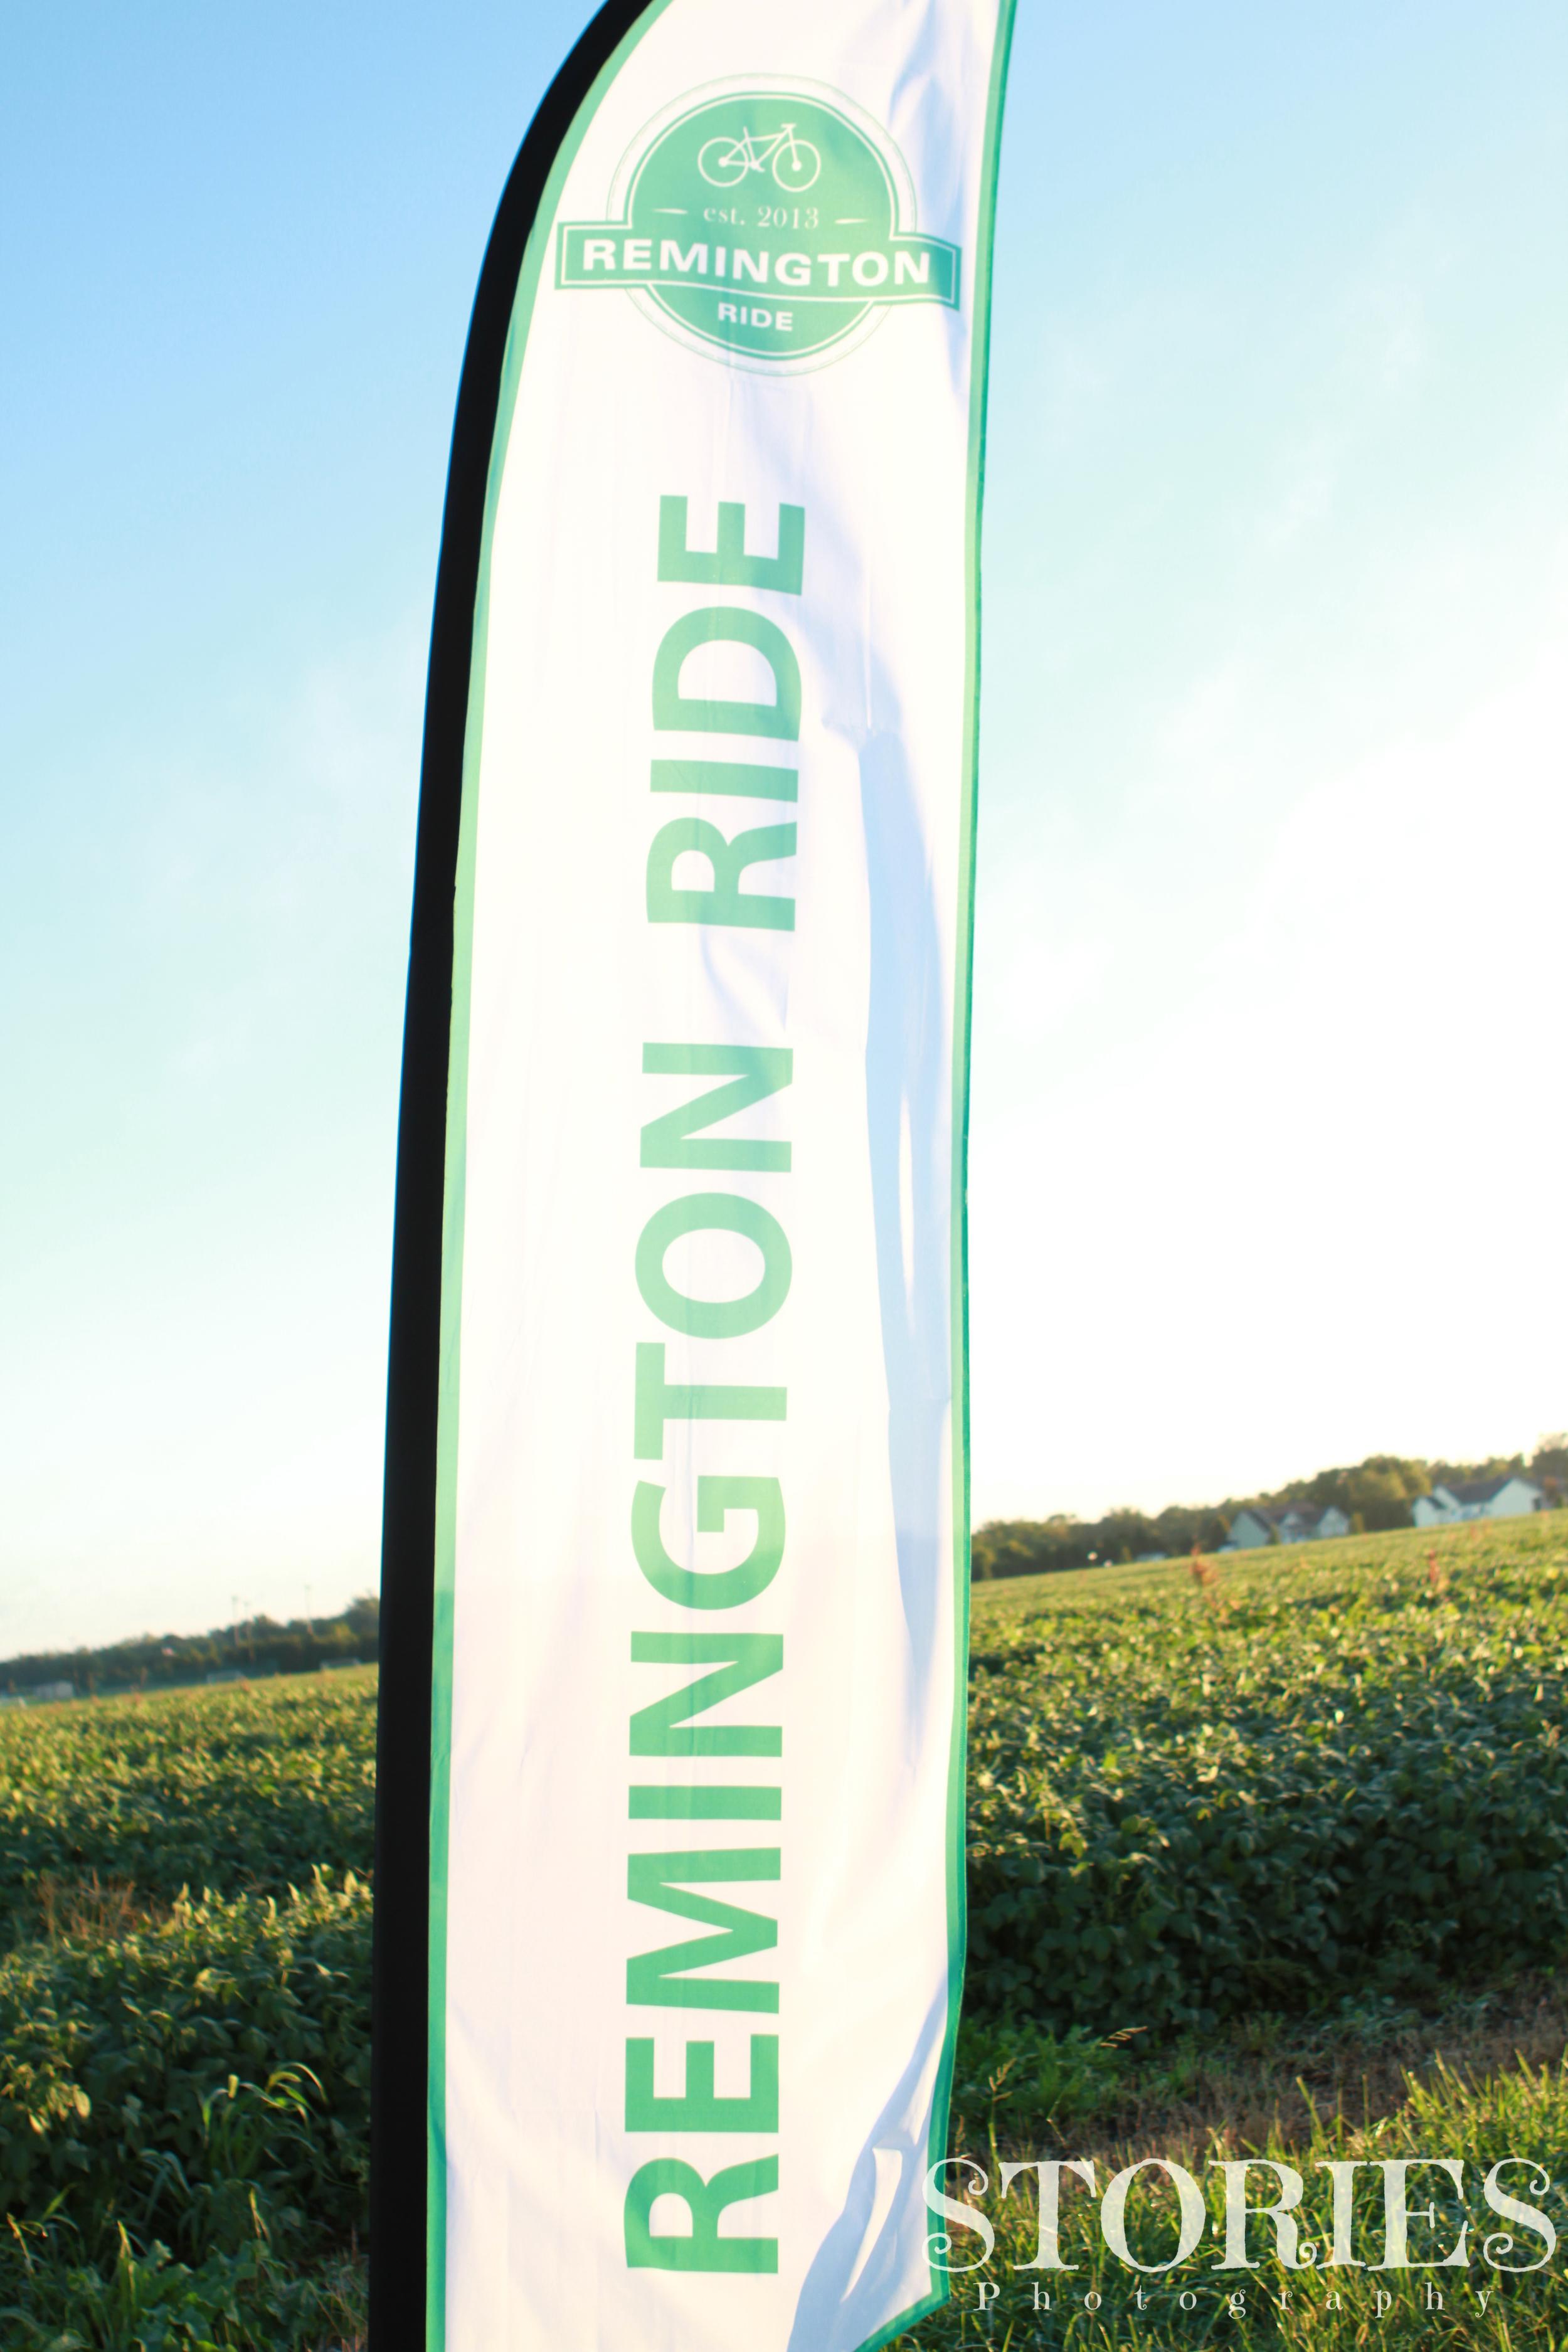 Remington Ride entrance